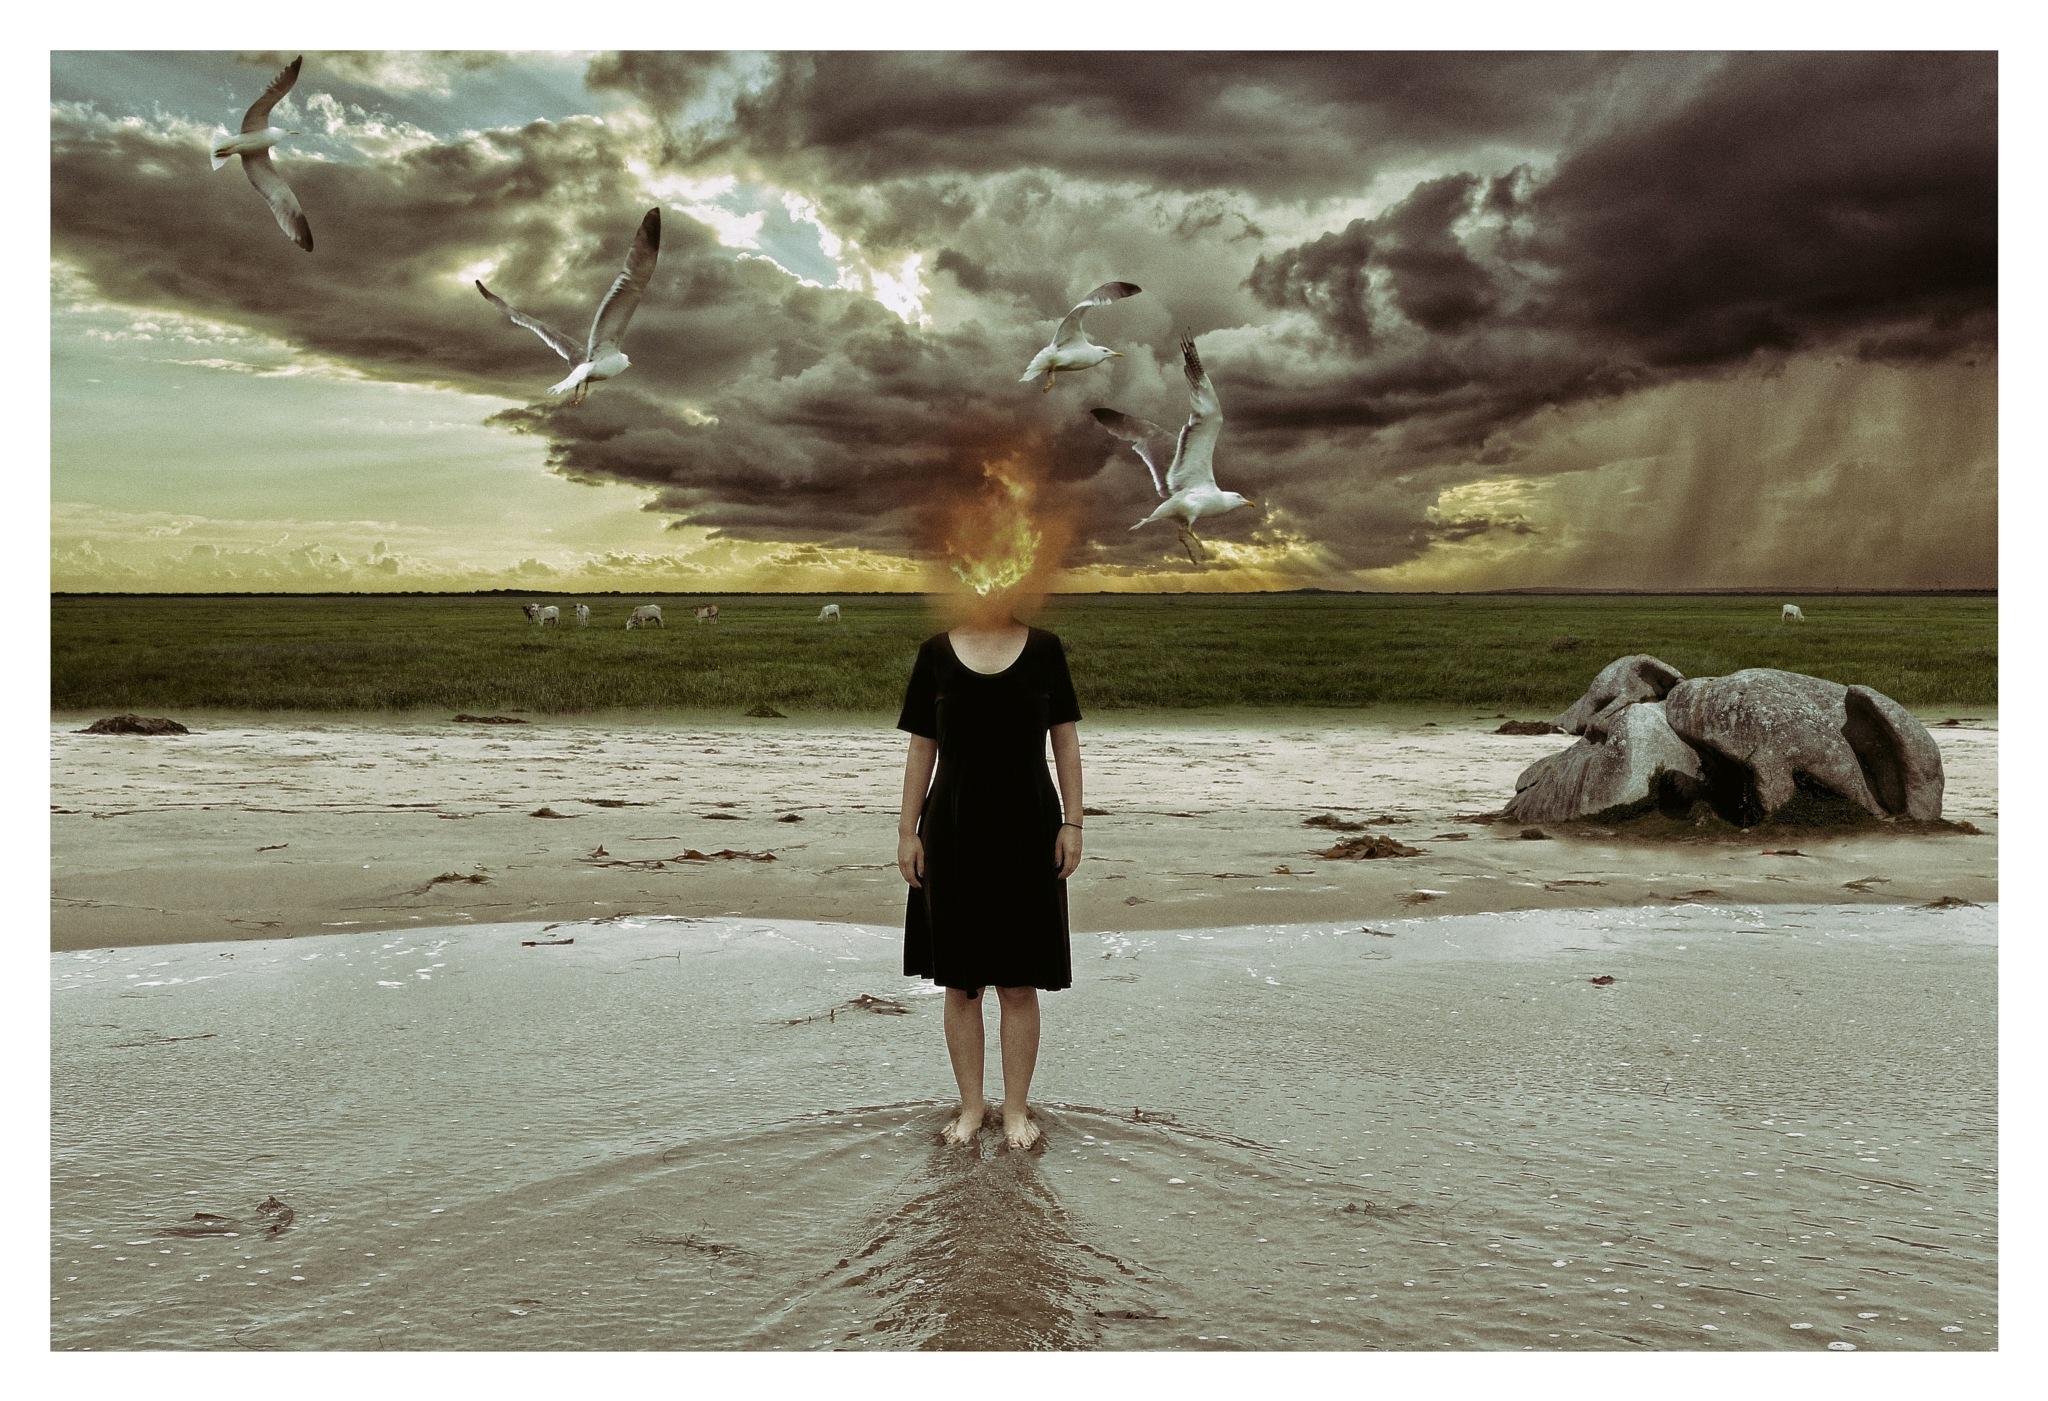 Sorrow. by Abigail González  Piña